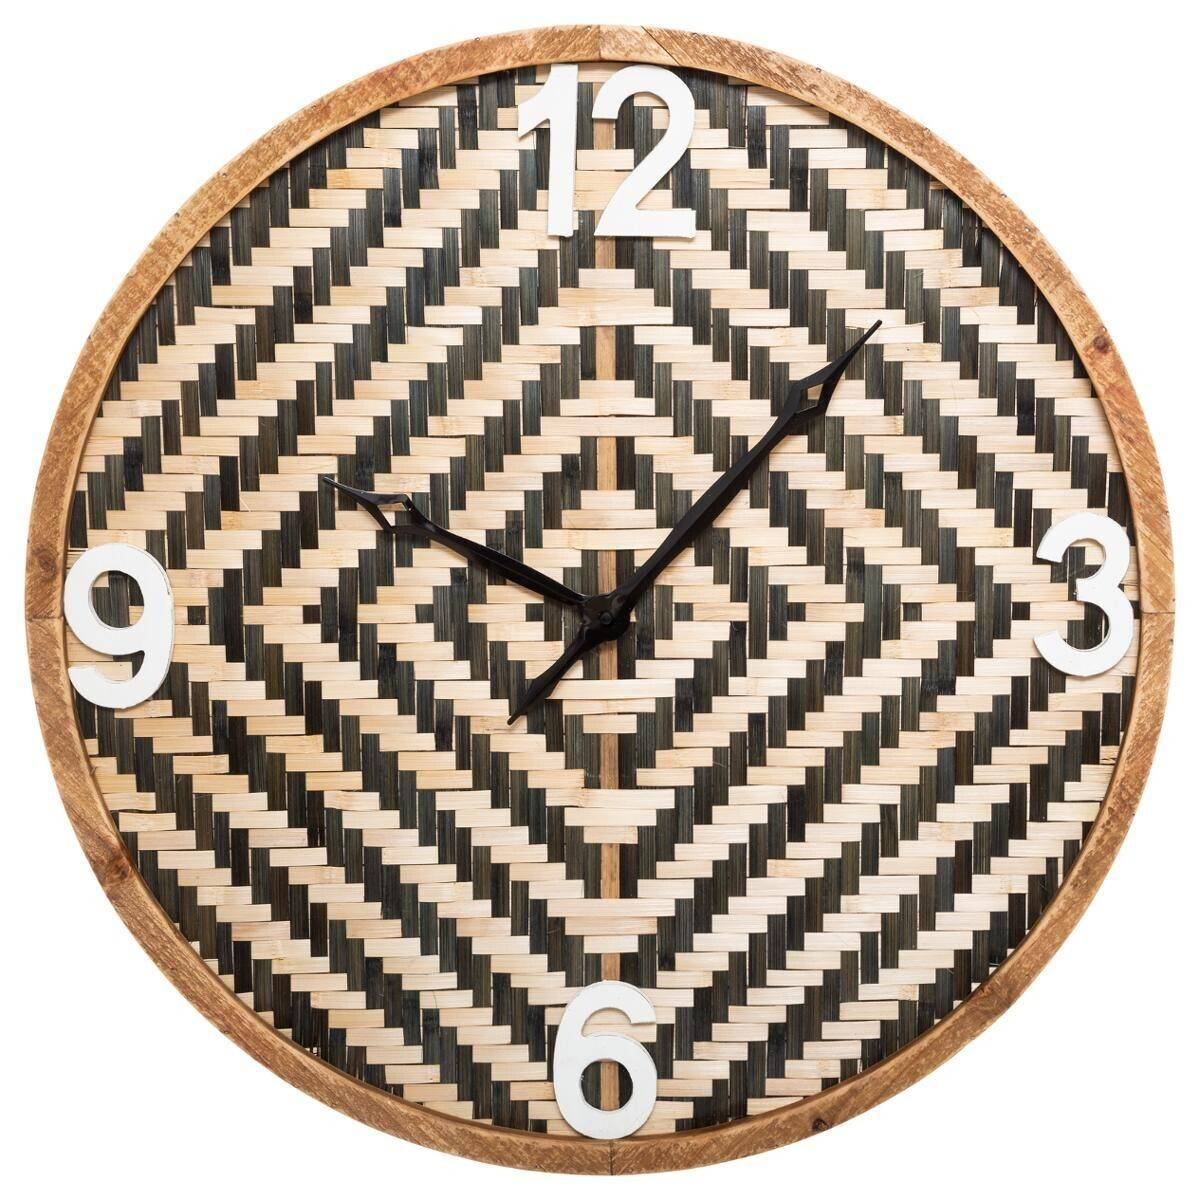 Atmosphera Horloge en bambou tressé D63 cm